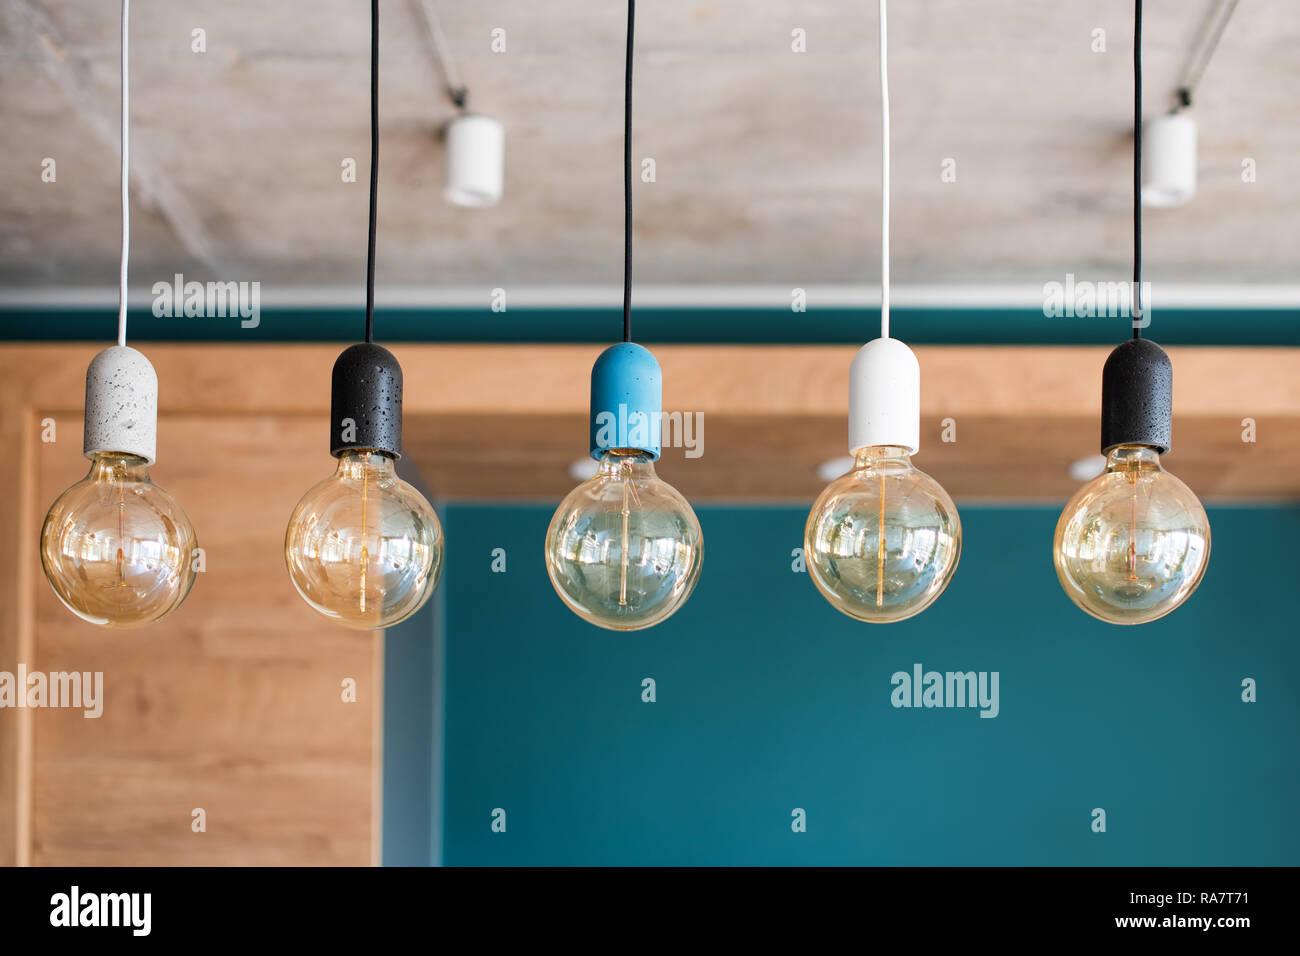 Lampadina A Incandescenza Storia edison lampade retrò. le lampadine a incandescenza sul muro